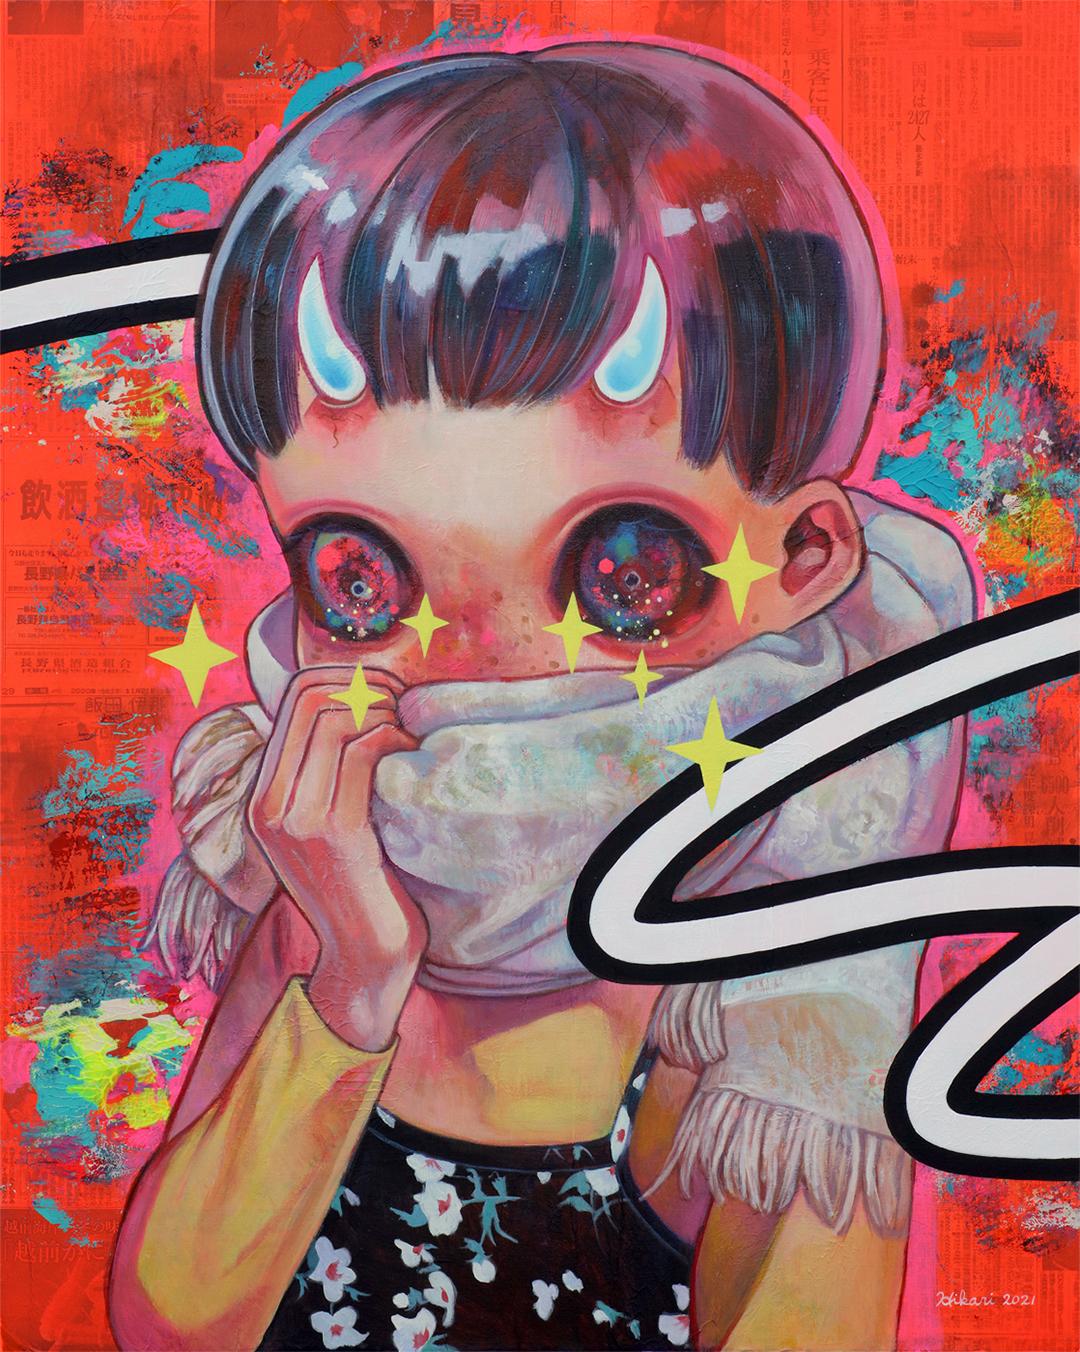 GirlsclubAsia-Artist-Hikari Shimoda_Living Now #2_Acrylic, oil and newspaper on canvas_35.8 x 28.6